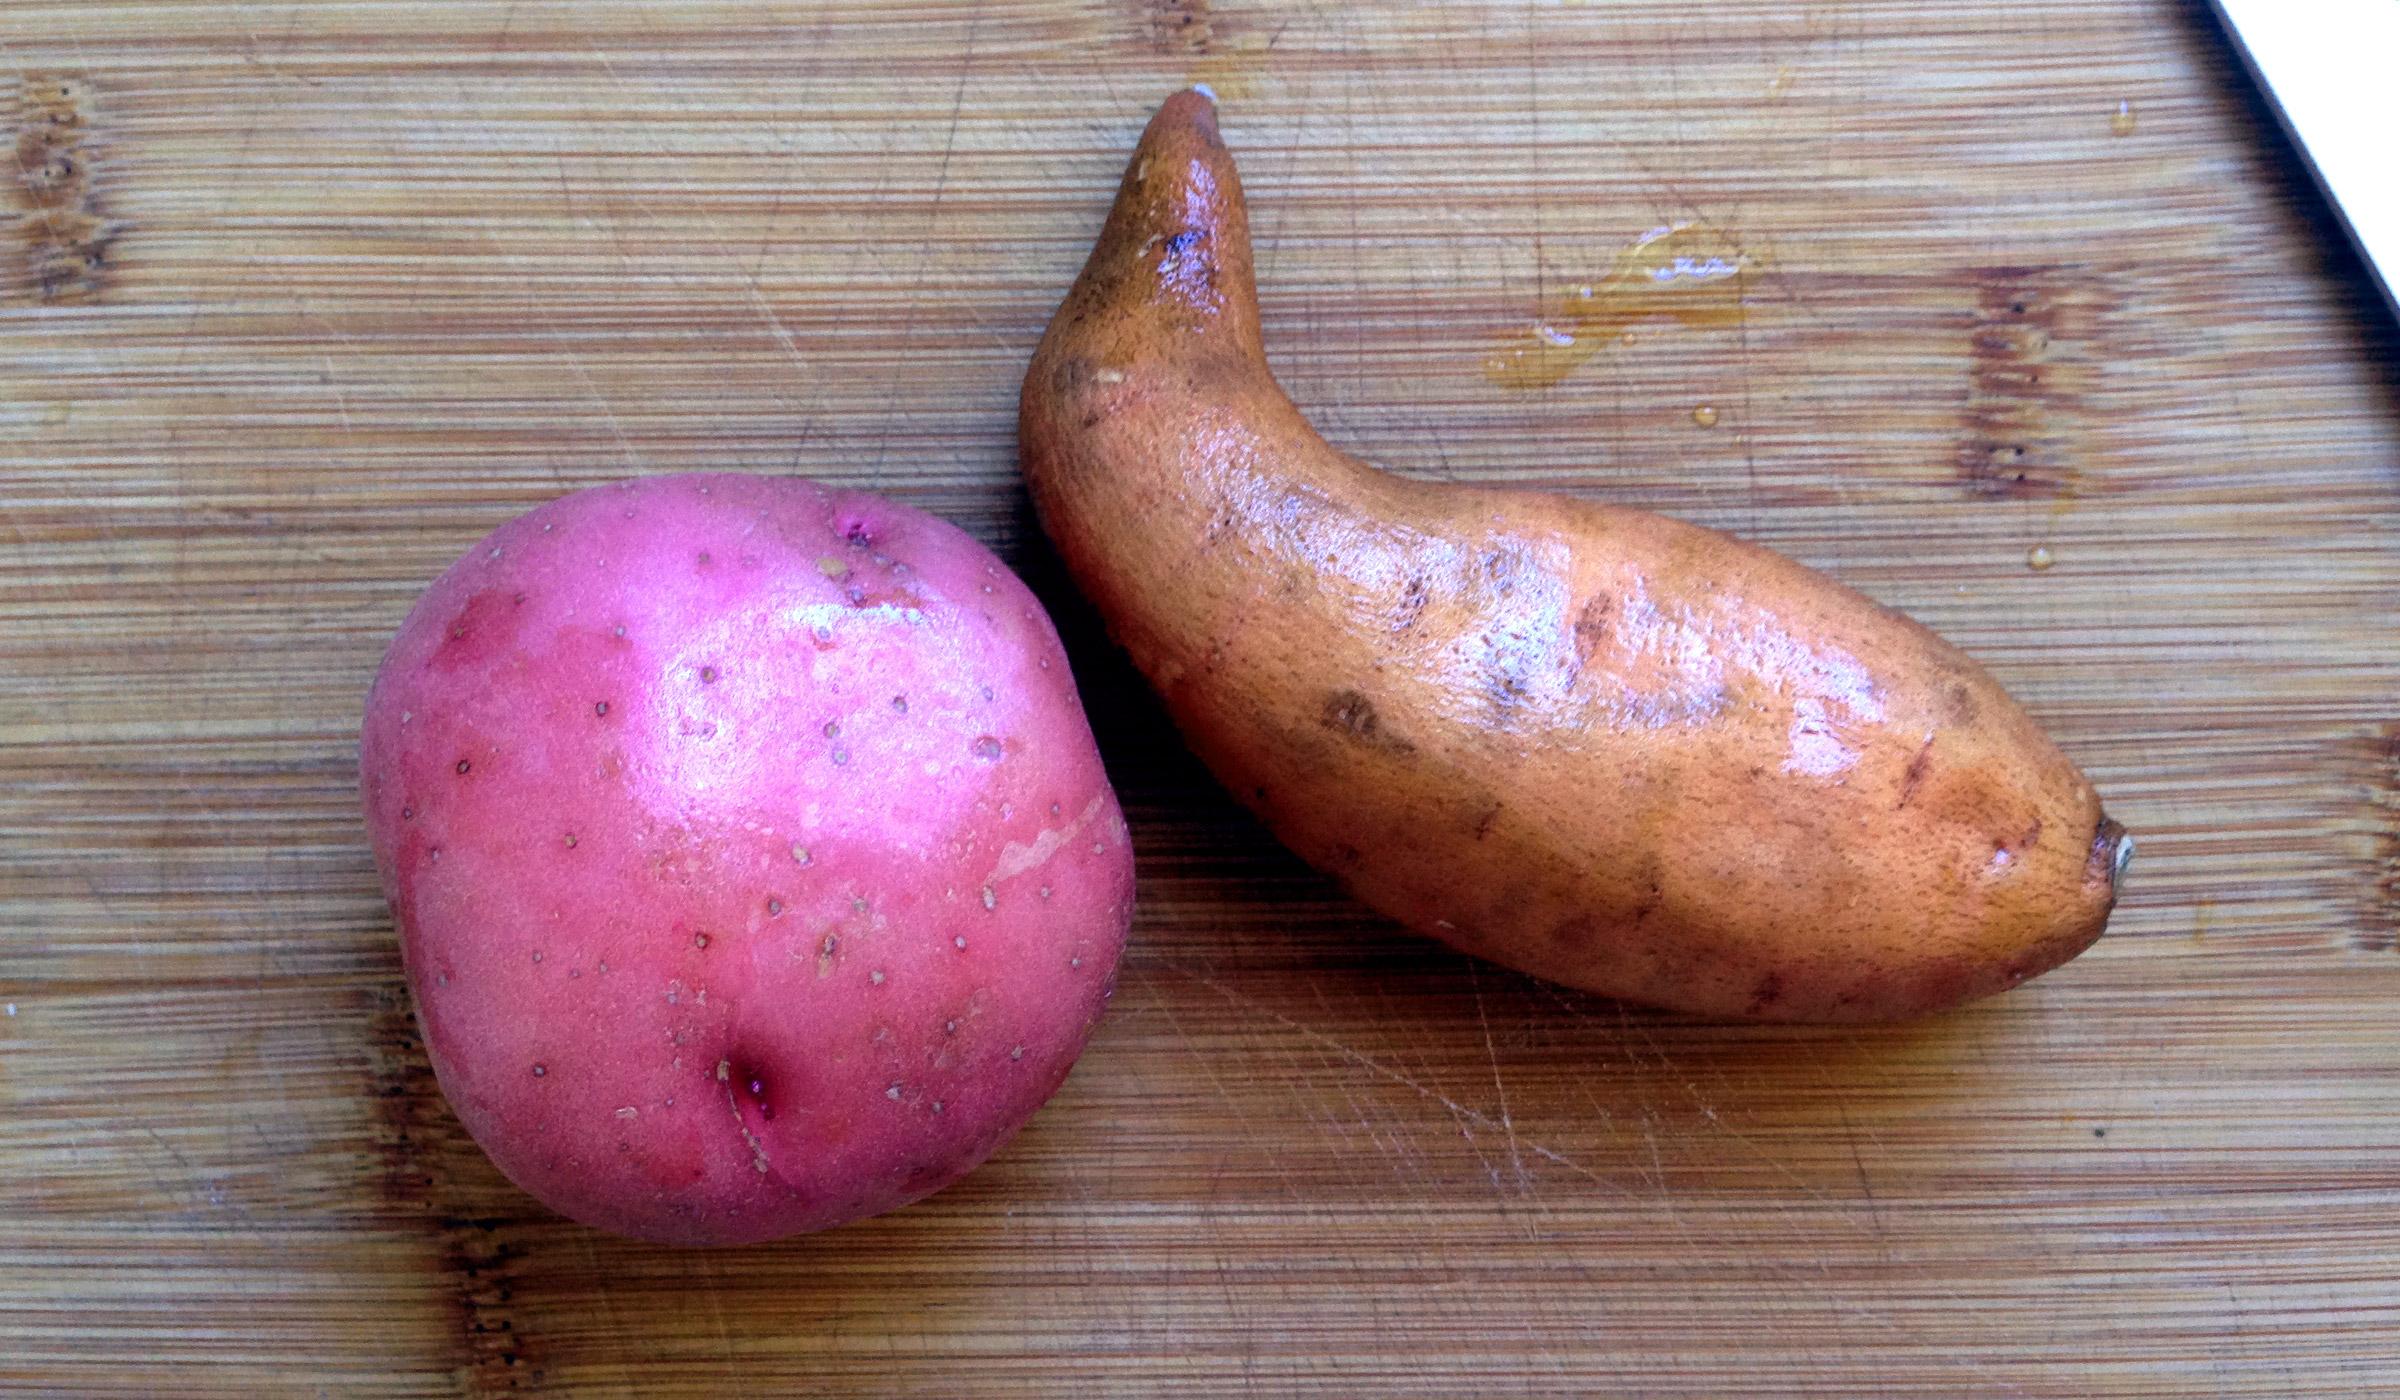 medium size potatoes